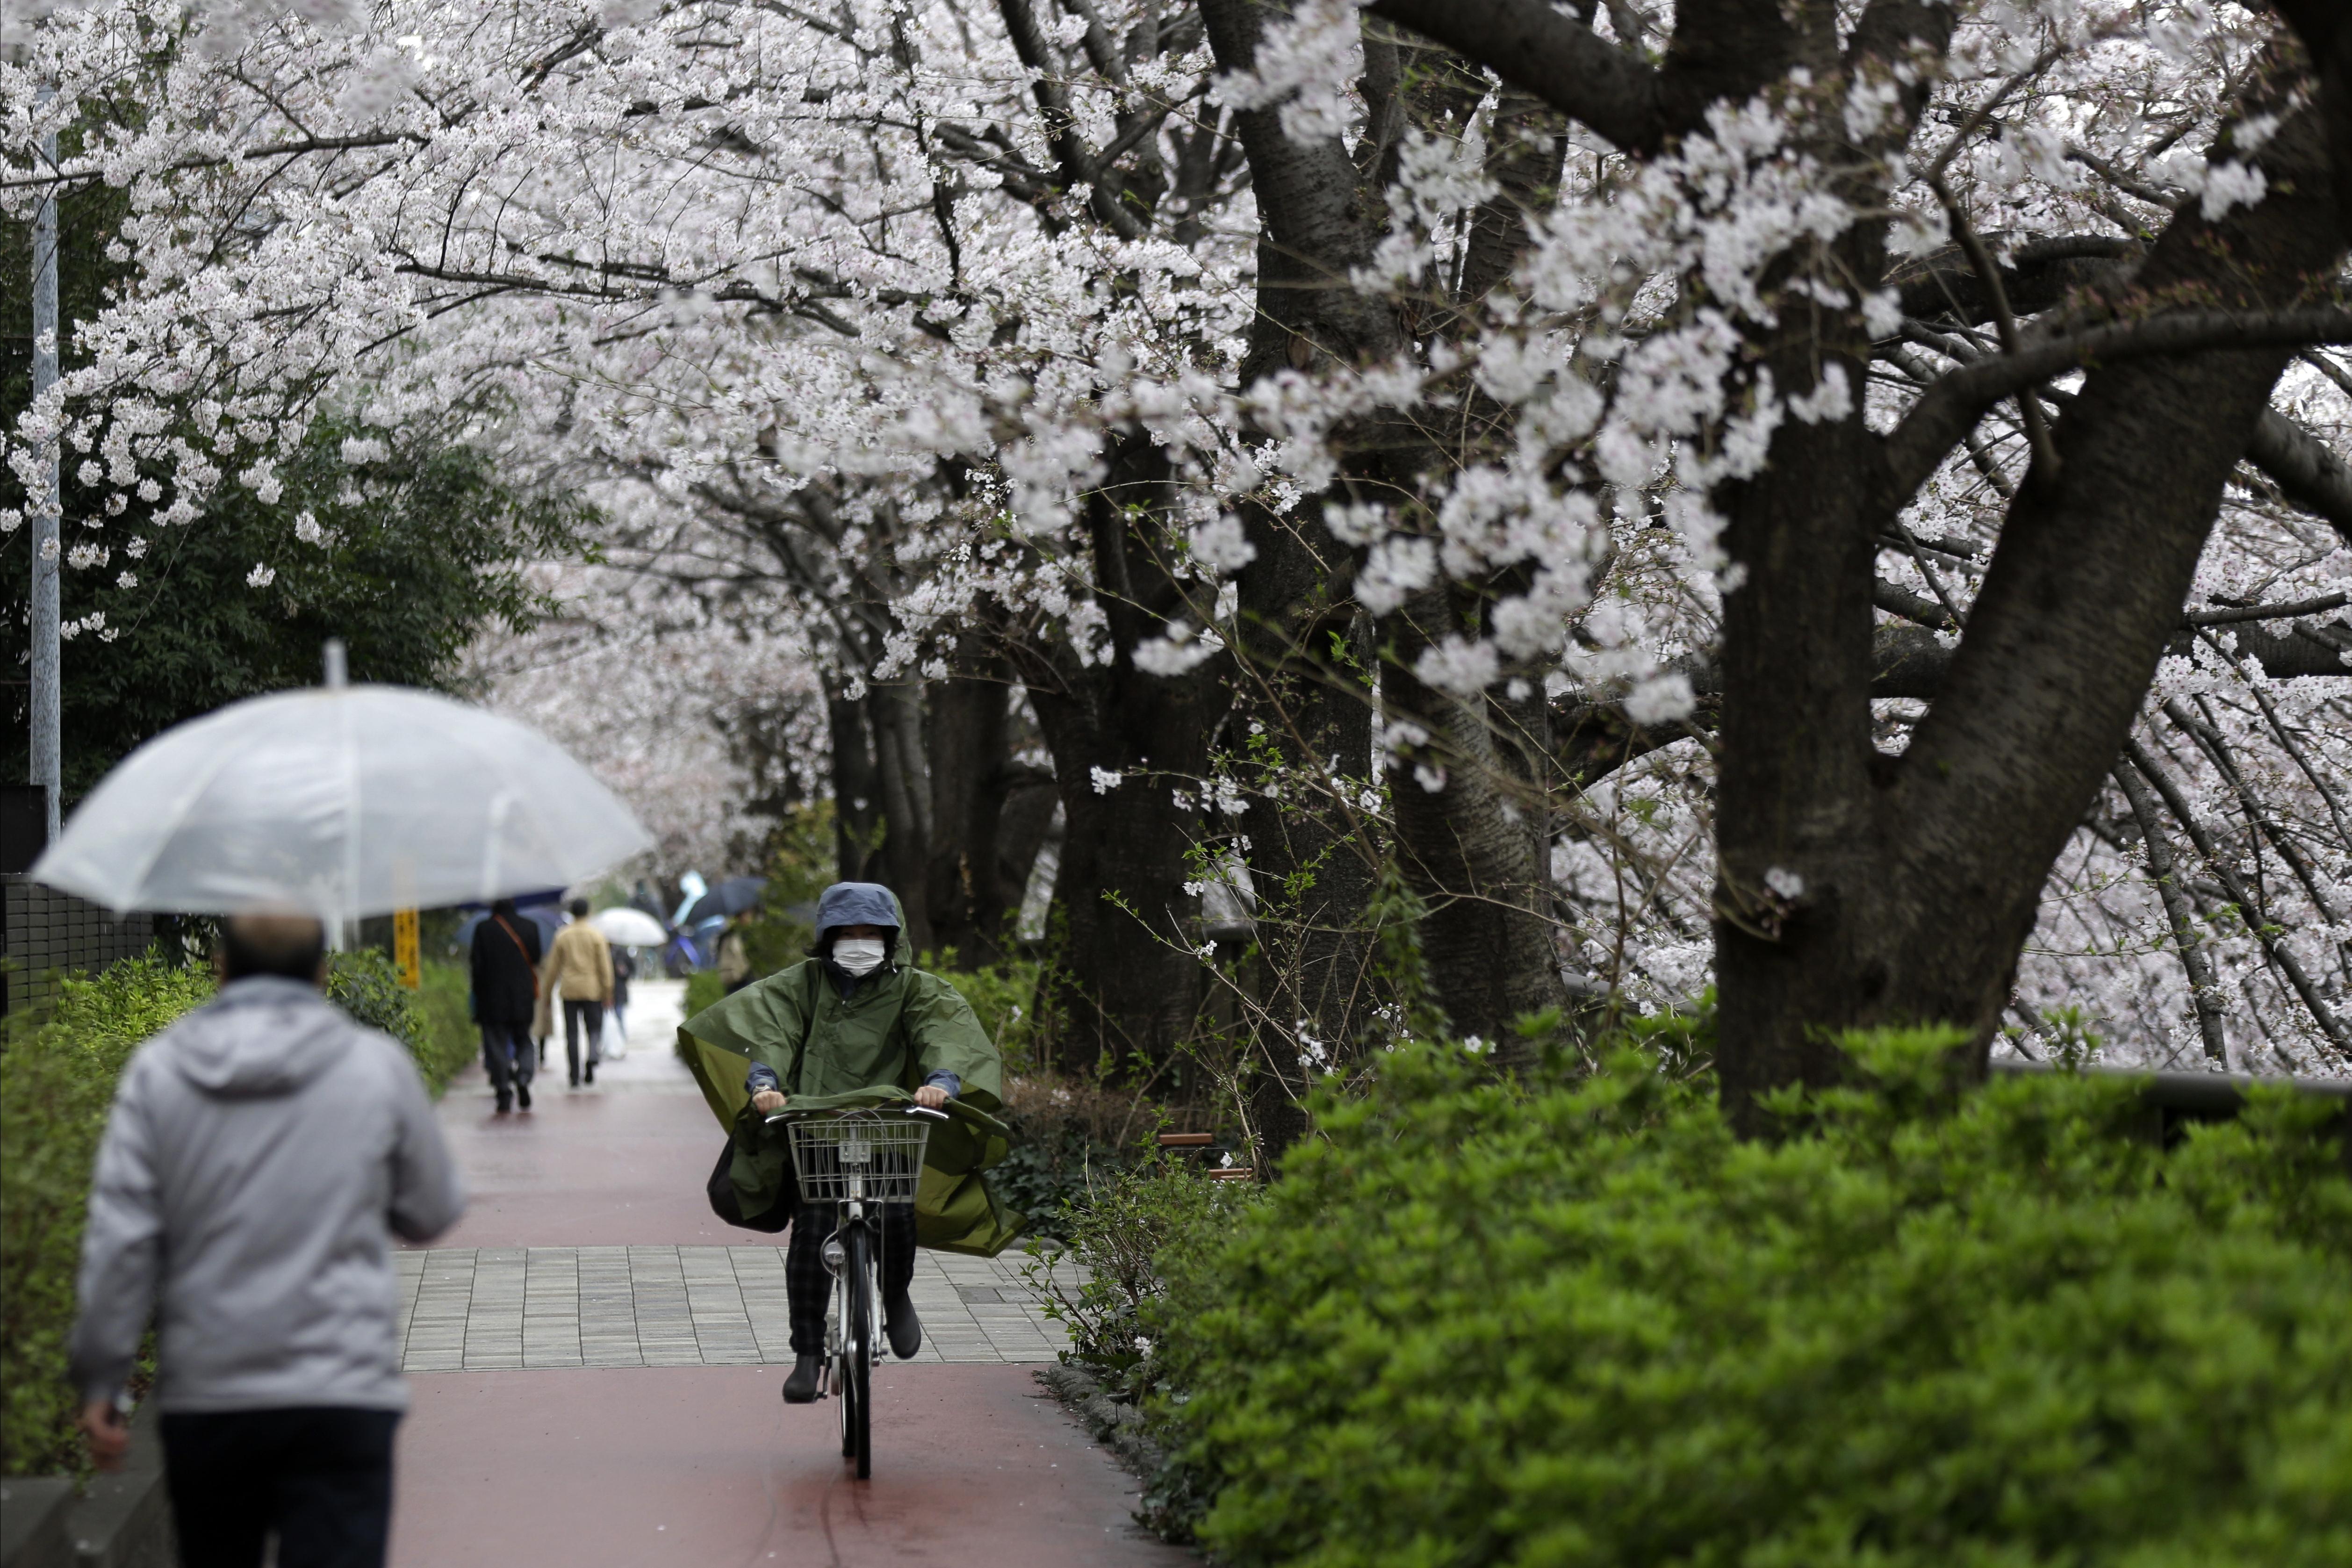 Cherry blossoms bloom over Meguro-gawa River Monday, March 23, 2020, in Tokyo. (AP Photo/Kiichiro Sato)